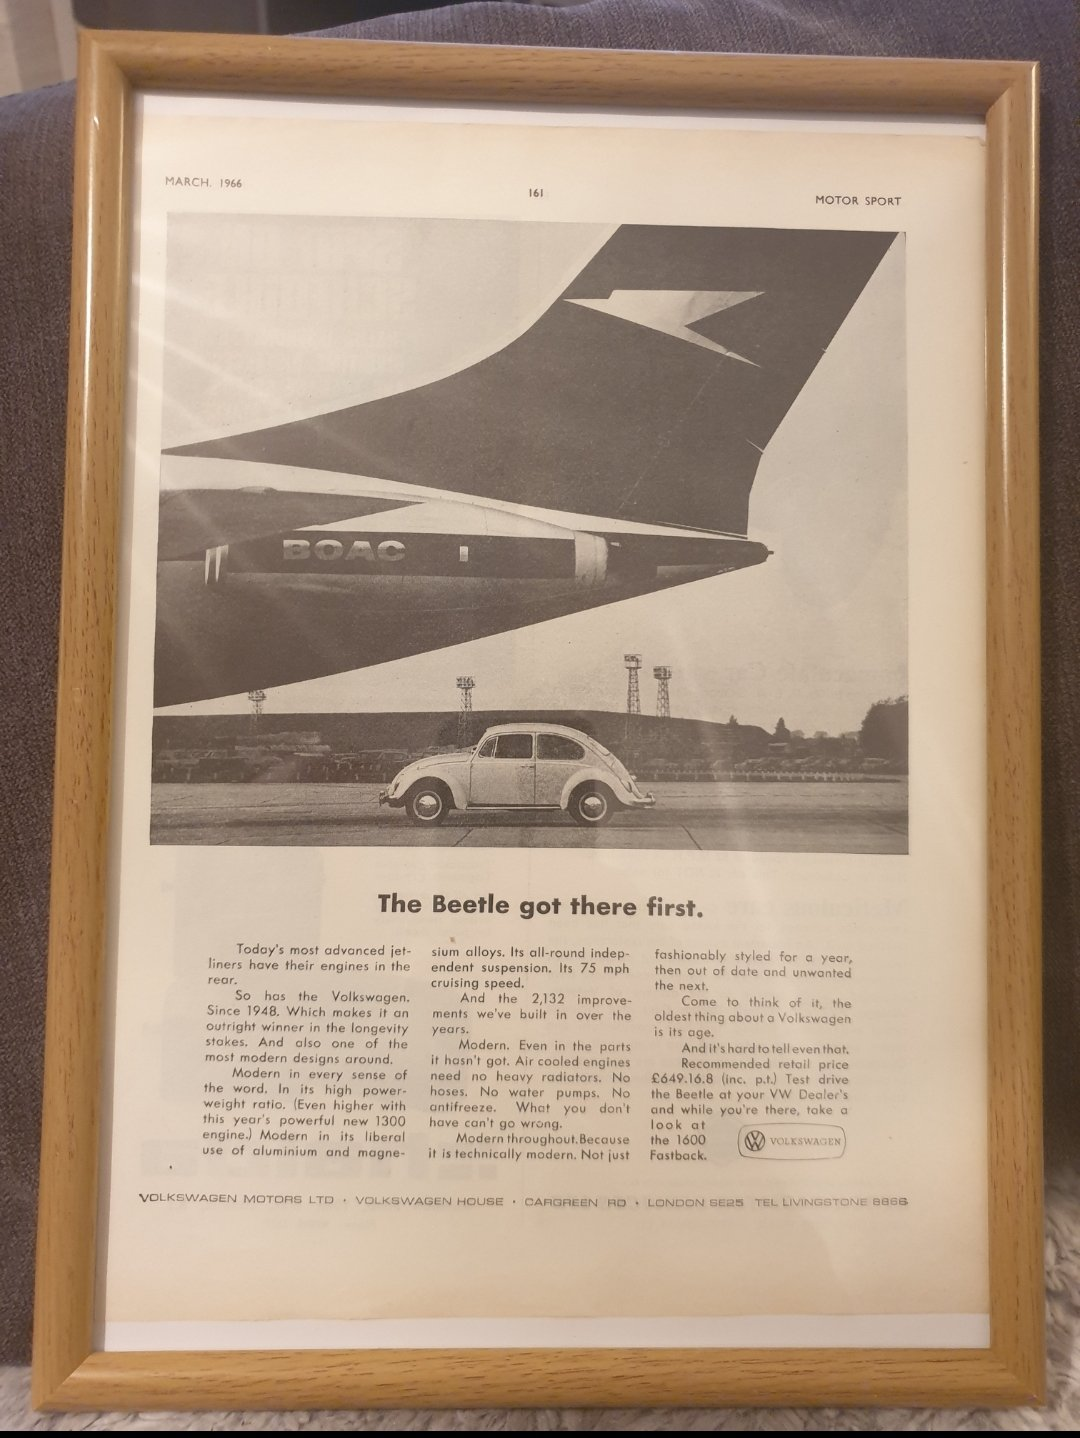 1966 VW Beetle Framed Advert Original  For Sale (picture 1 of 2)